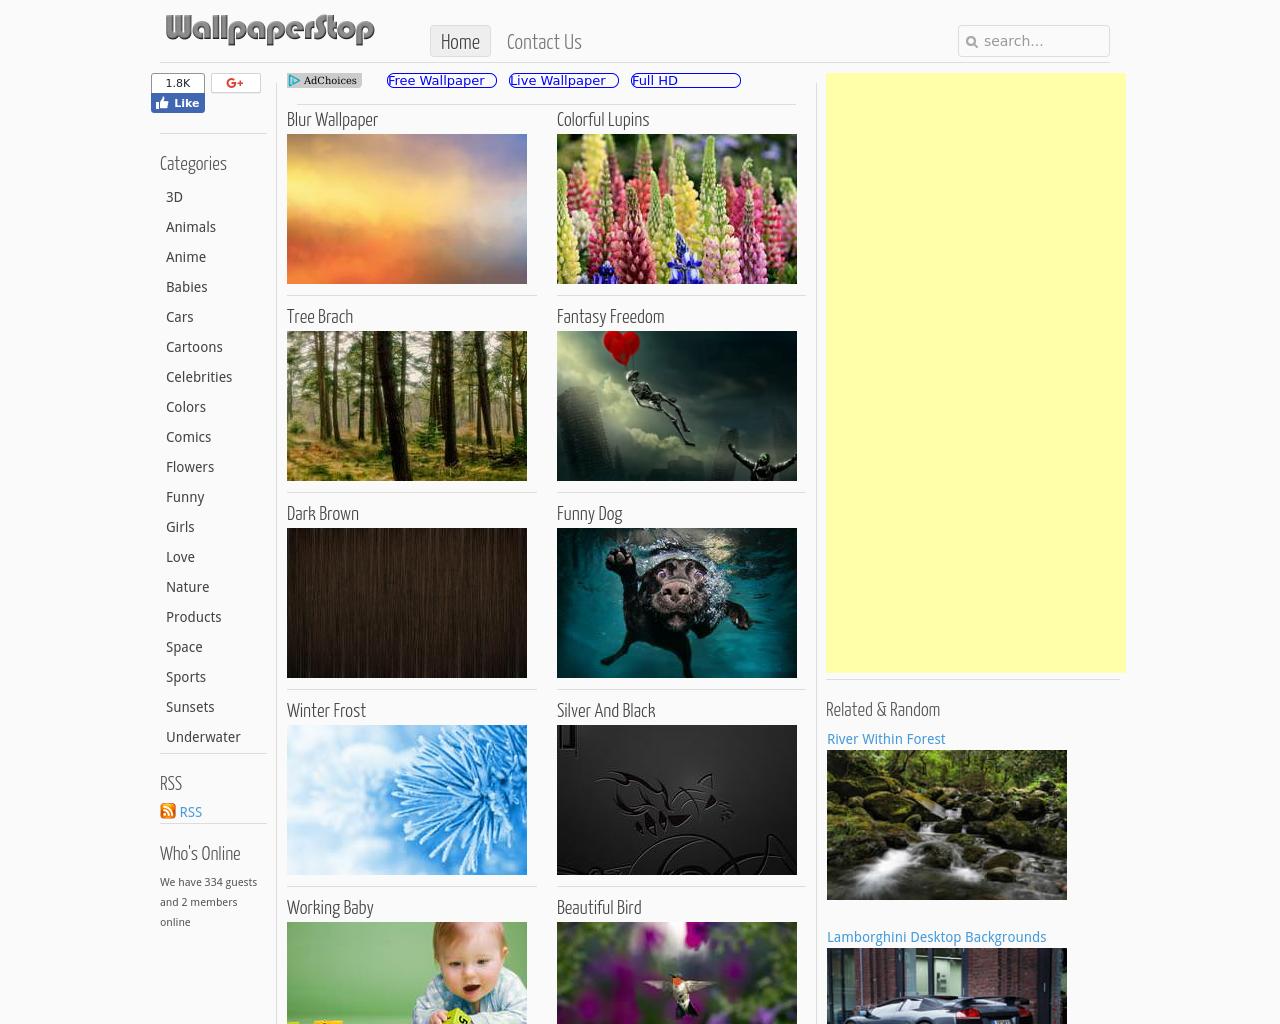 WallpaperStop-Advertising-Reviews-Pricing